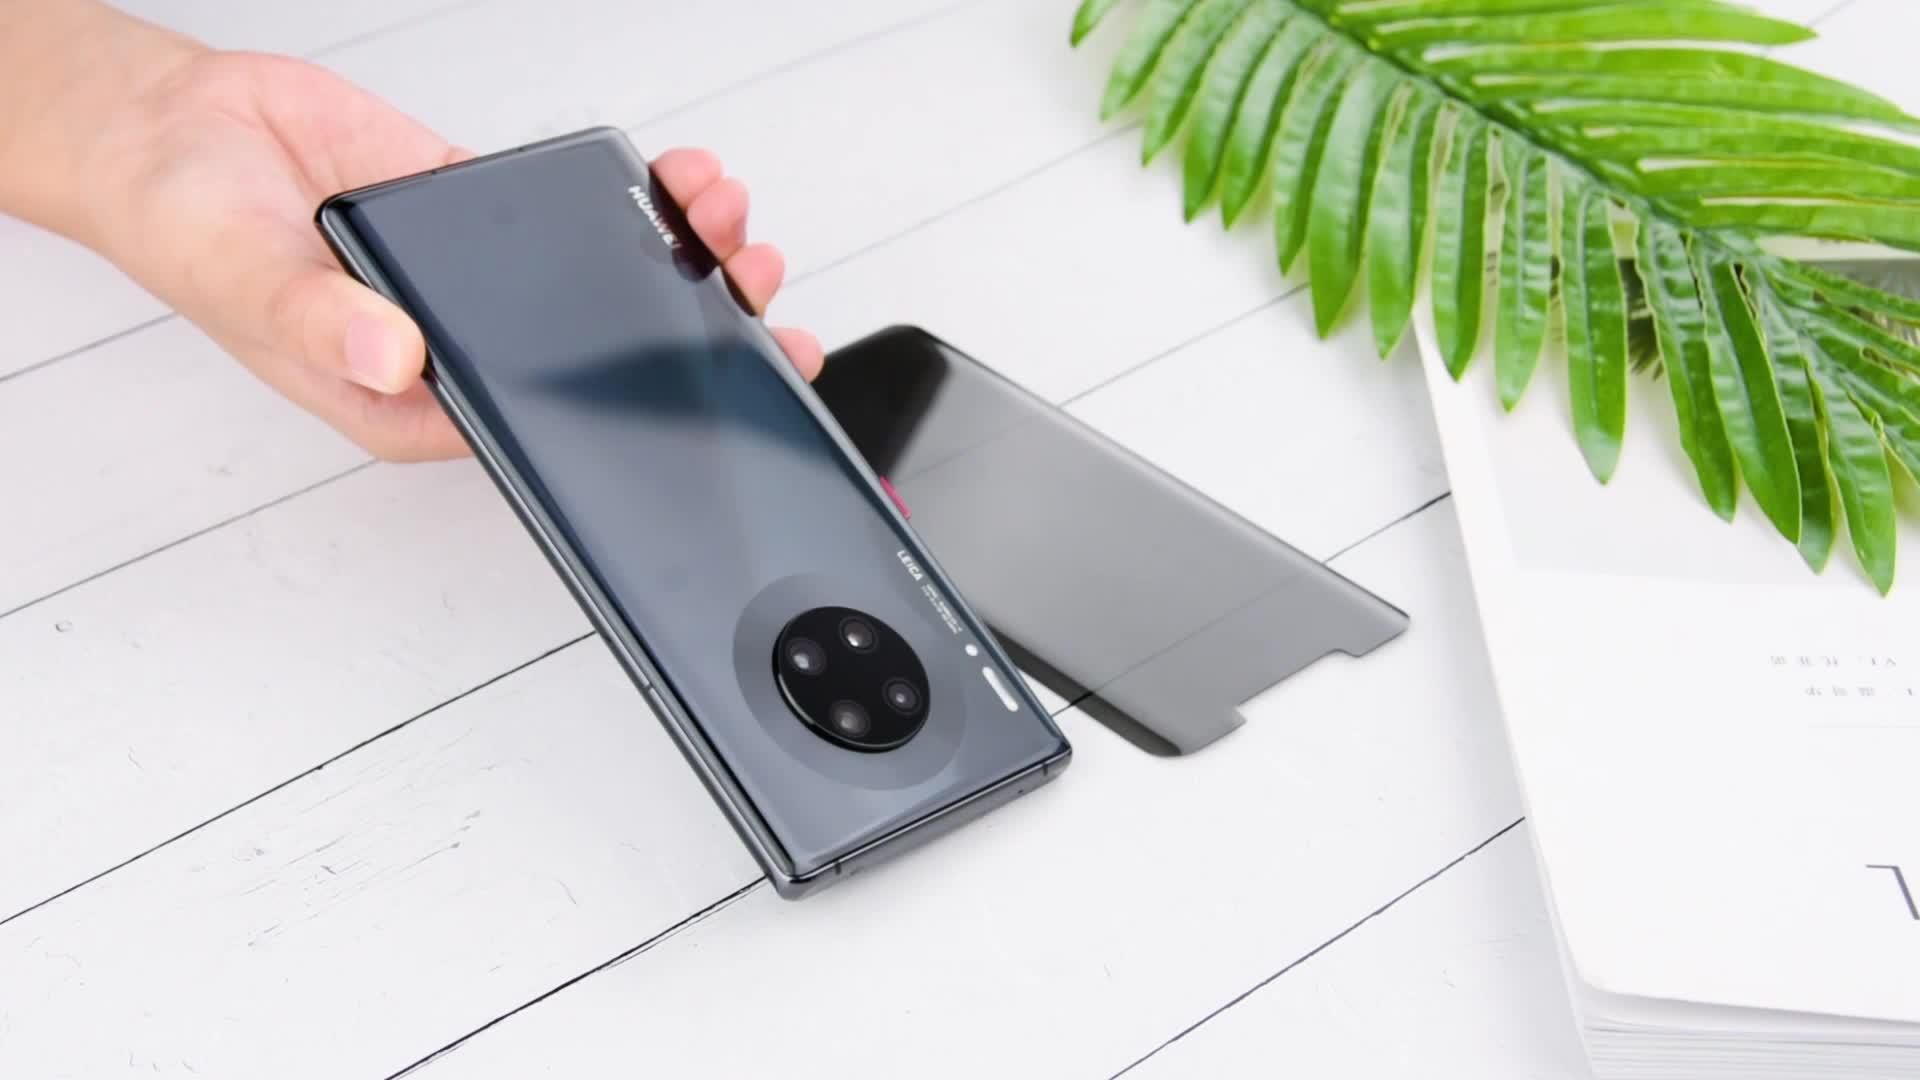 Anti-fingerprint privatsphäre gehärtetem glas für iphone 11 pro max screen protector